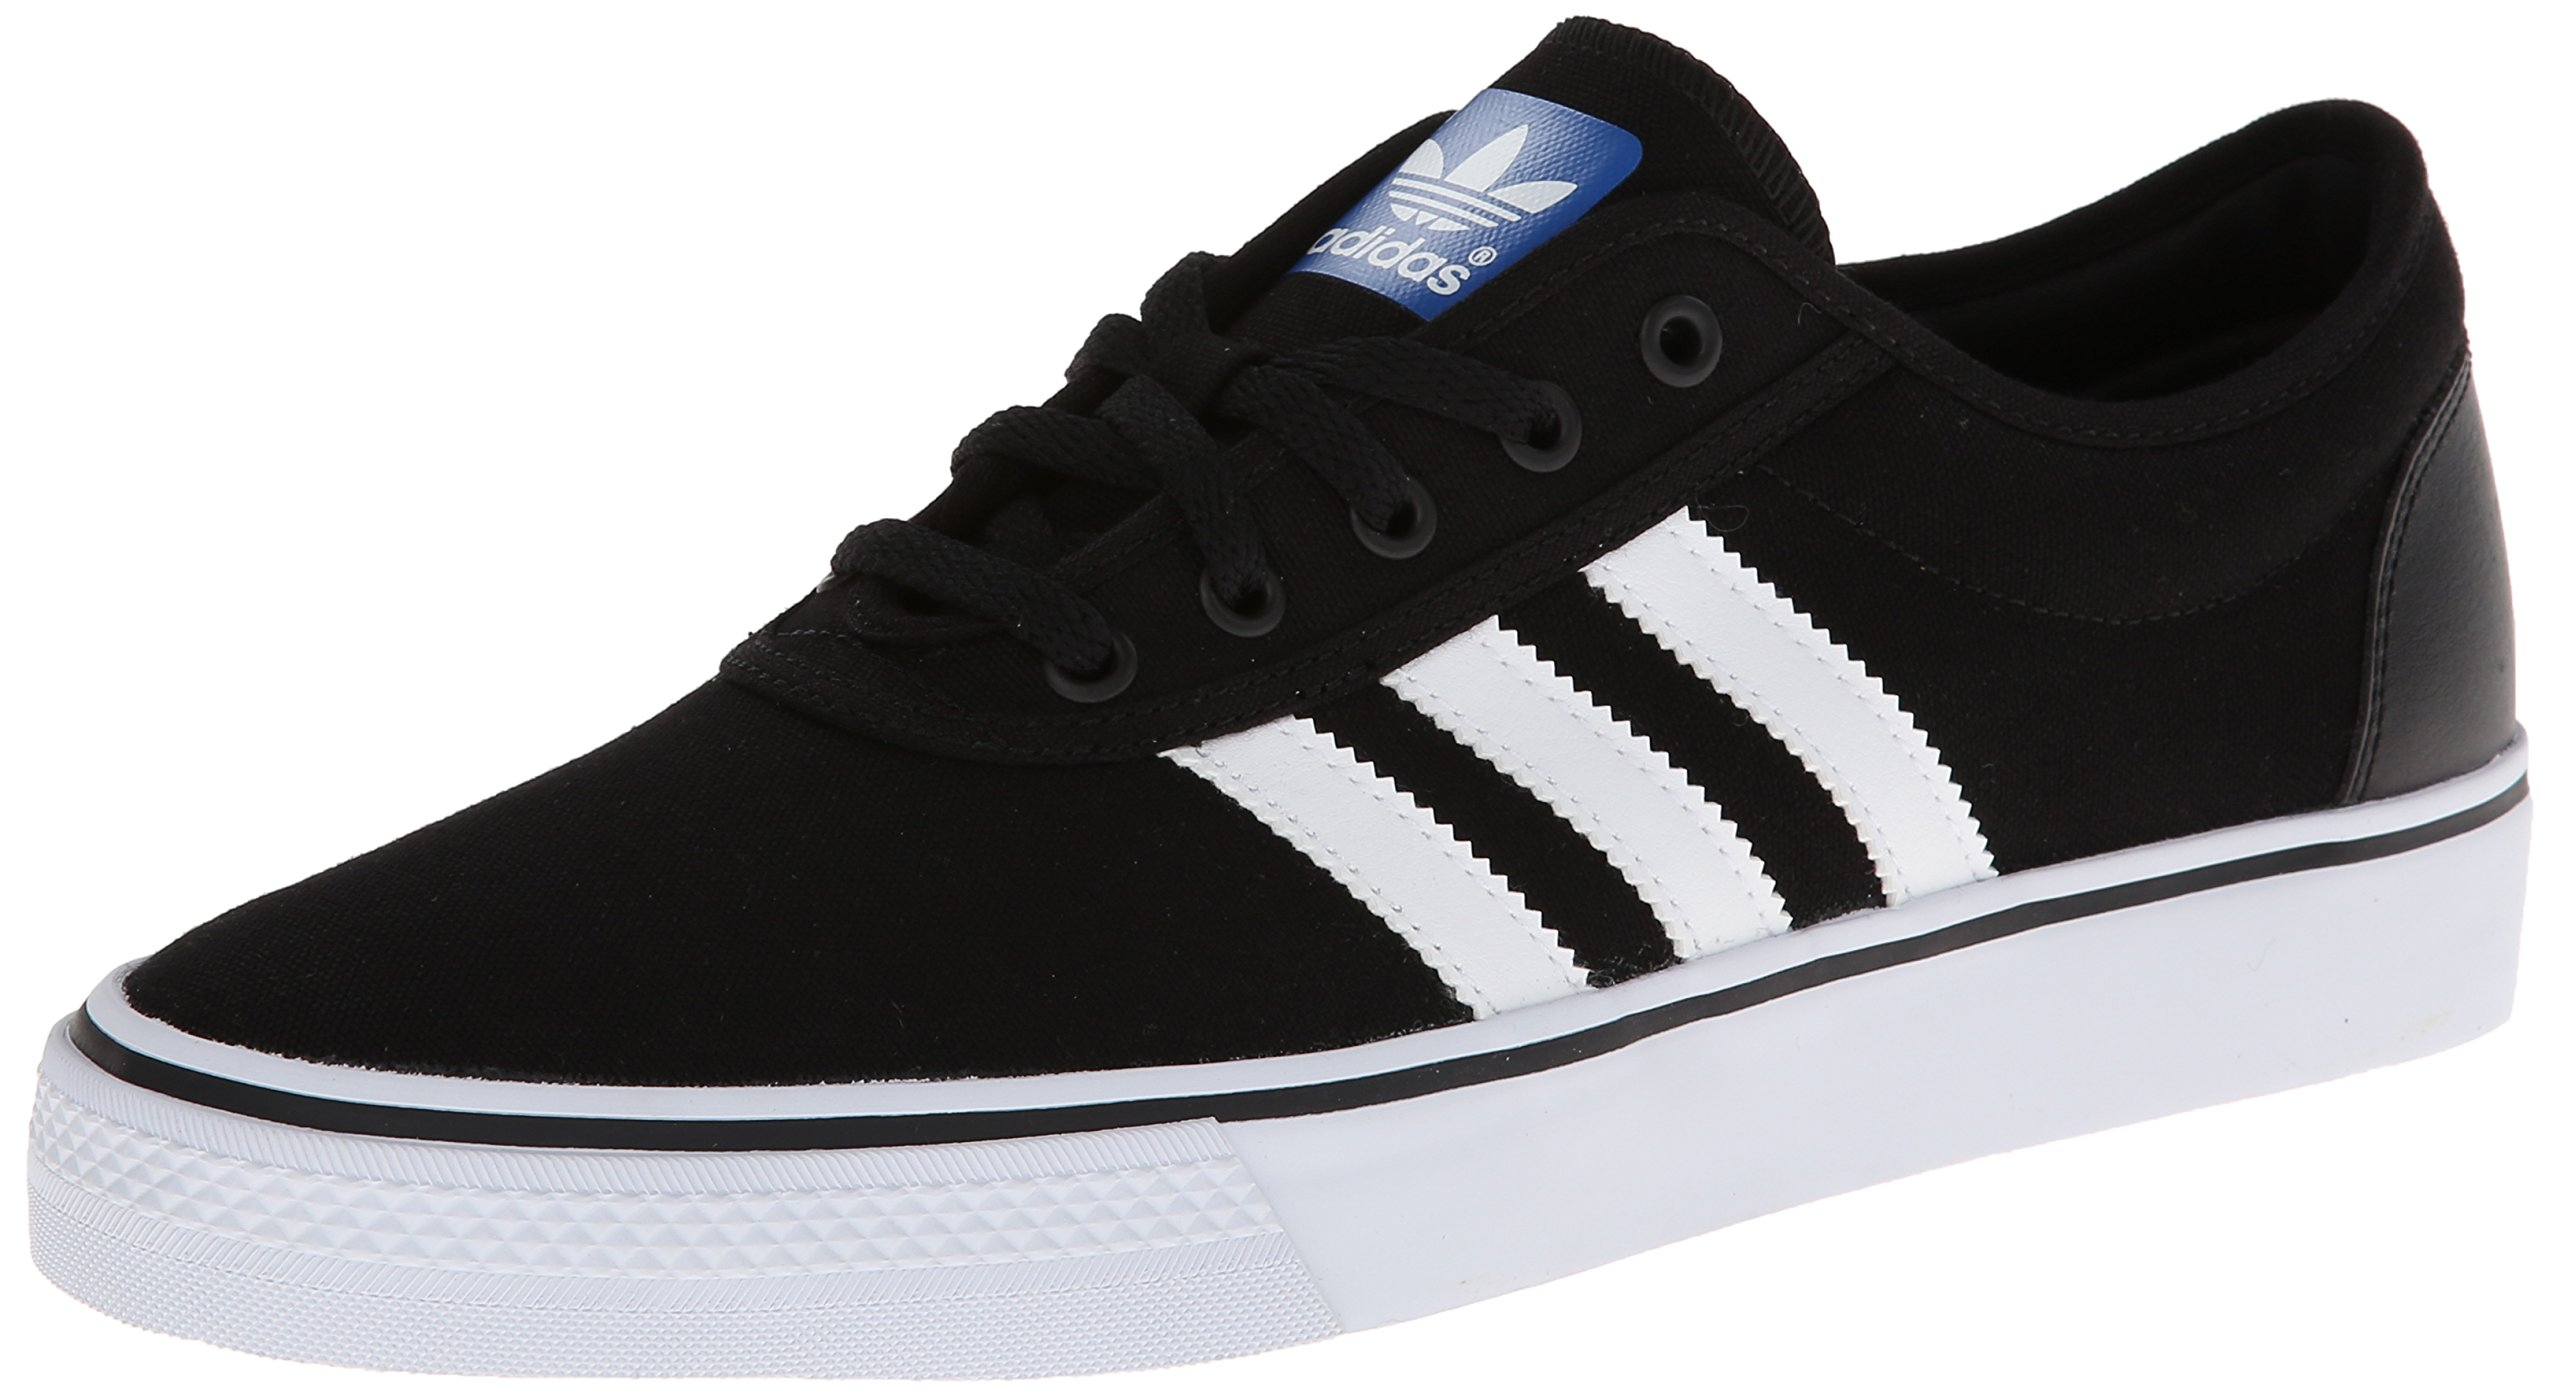 adidas Originals Men's Adi-Ease Skate Shoe,Black/White/Black,11 M US by adidas Originals